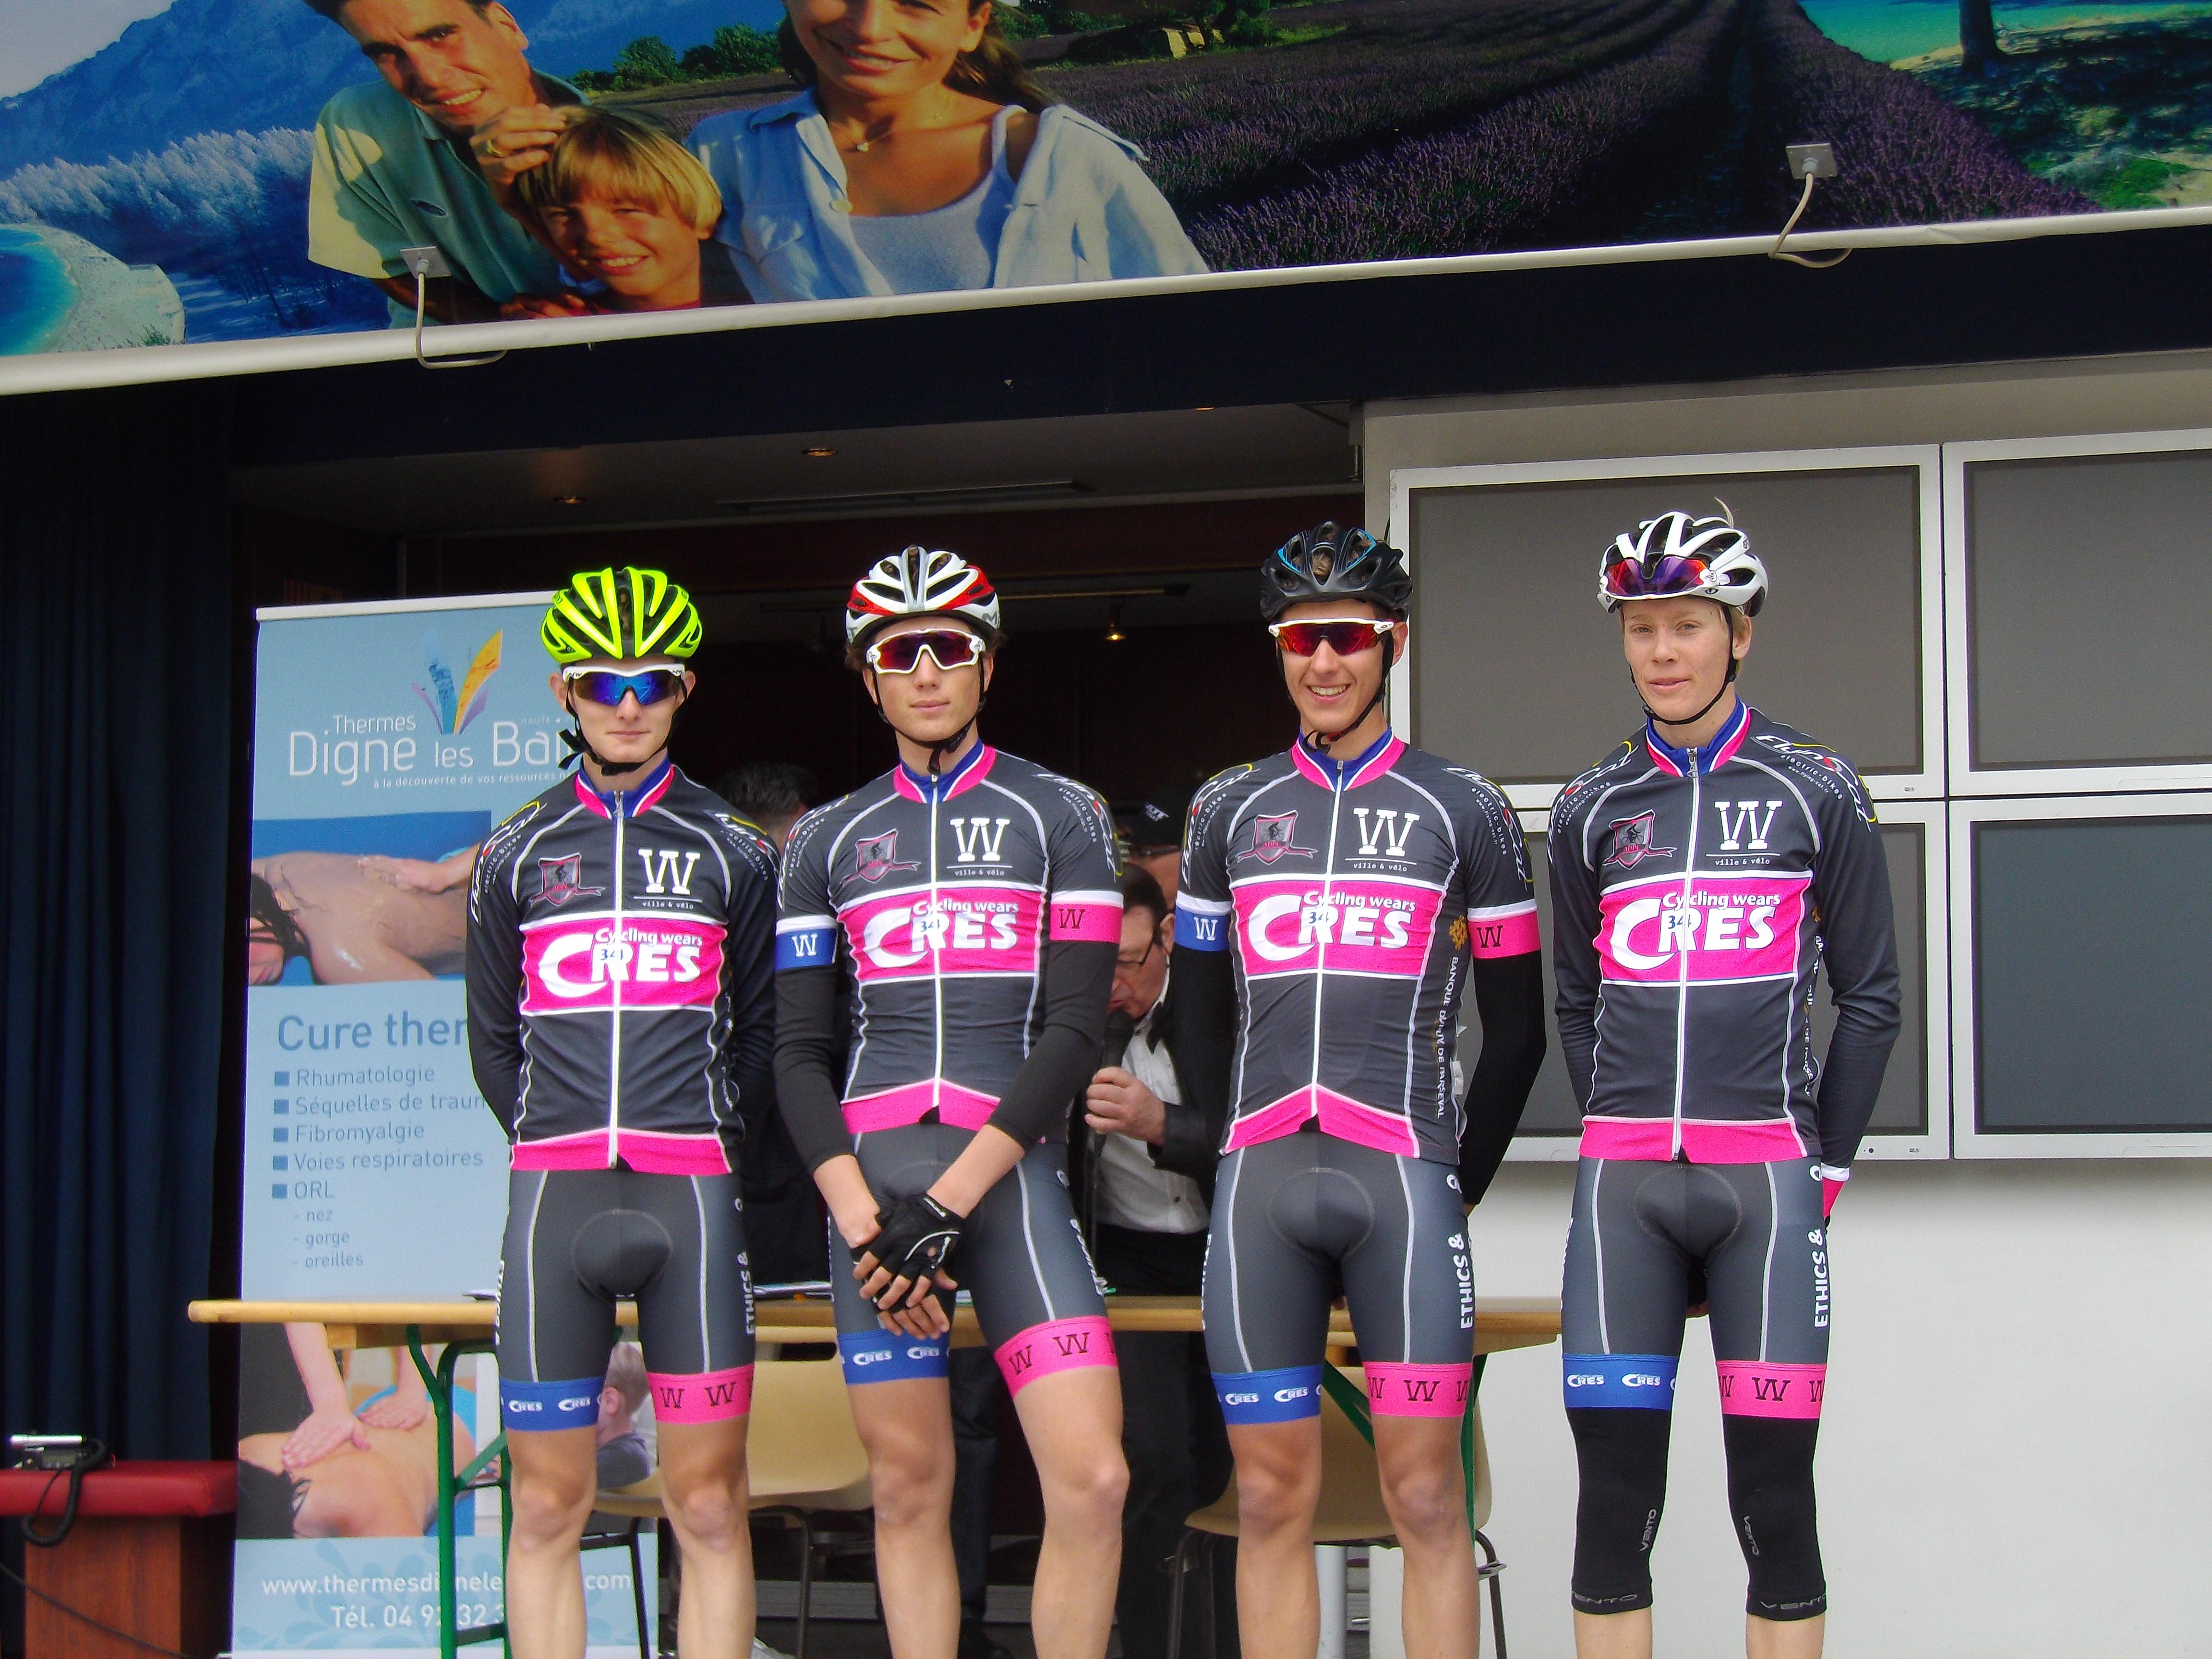 présentation podium 4ème étape Paca (4)